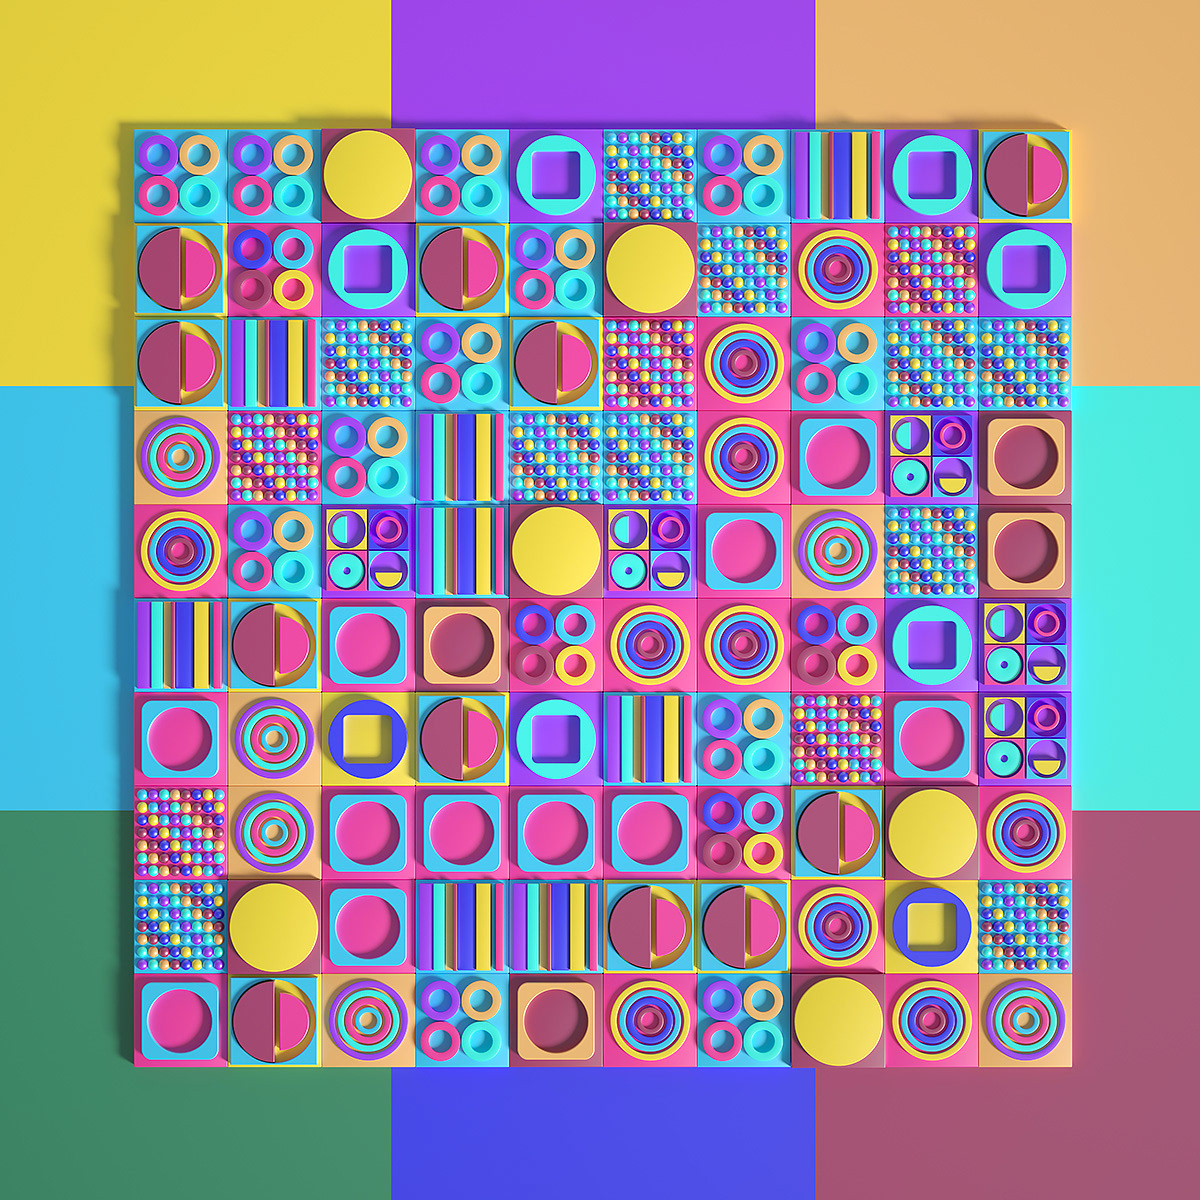 Image may contain: screenshot and colorfulness